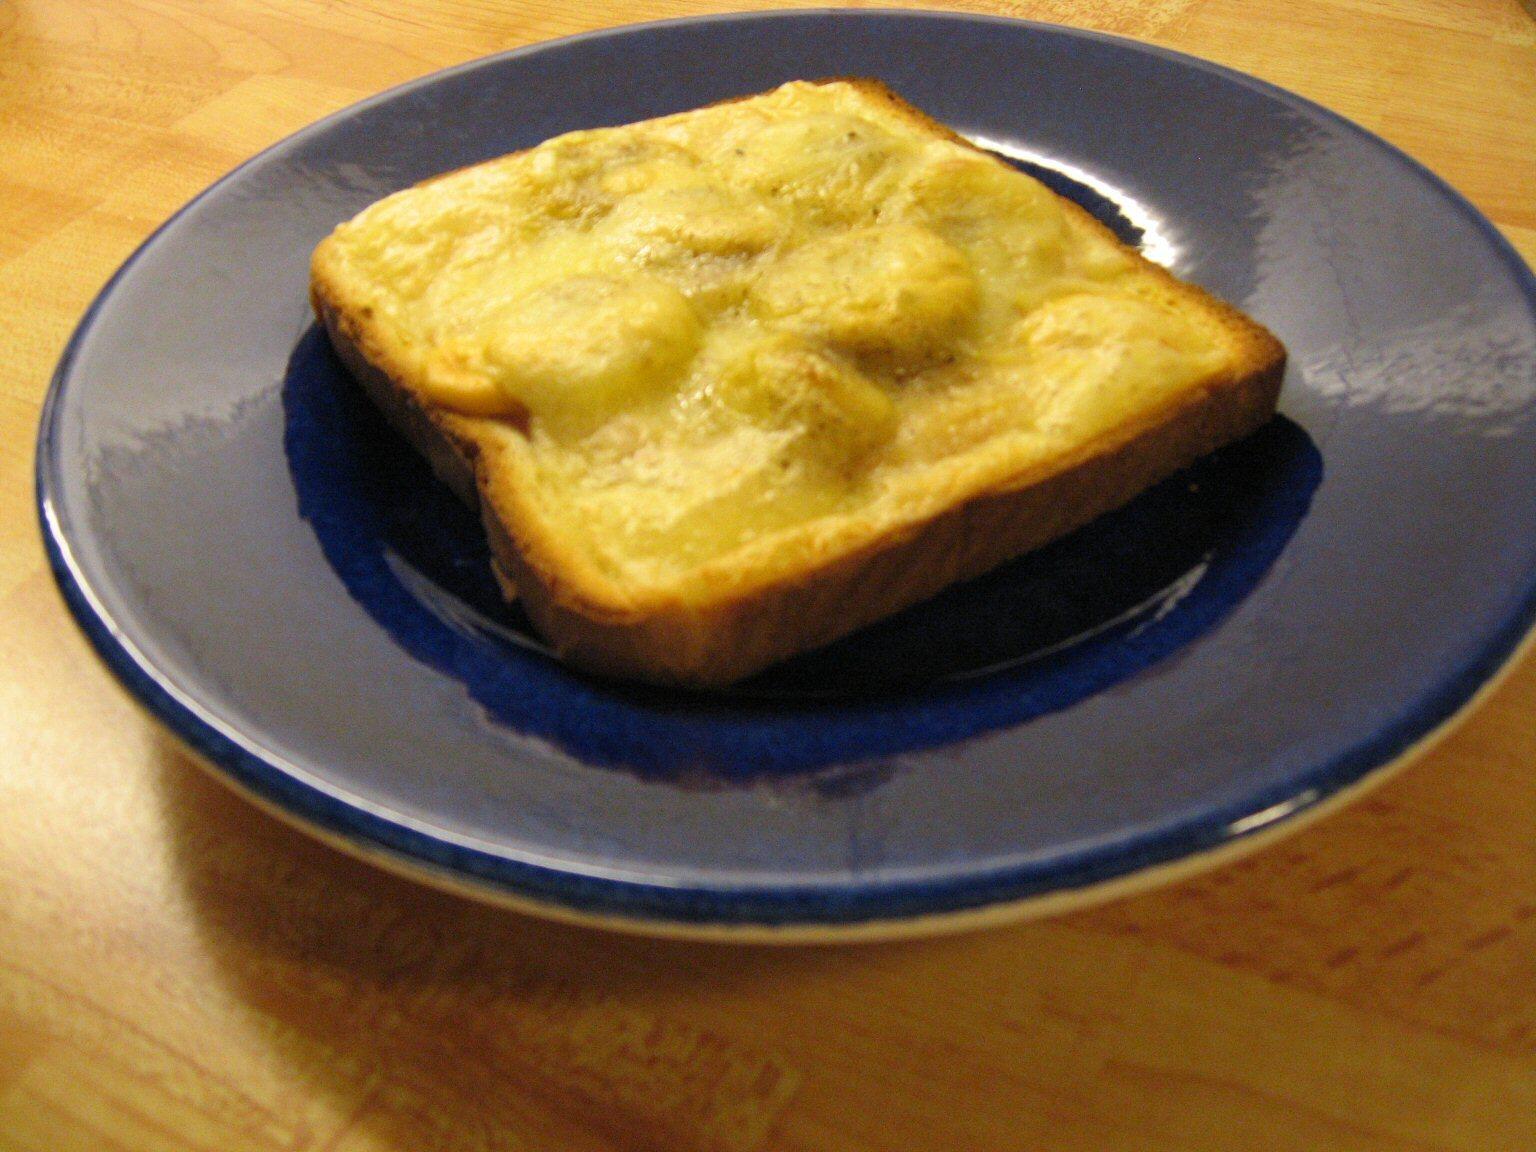 Africana toast